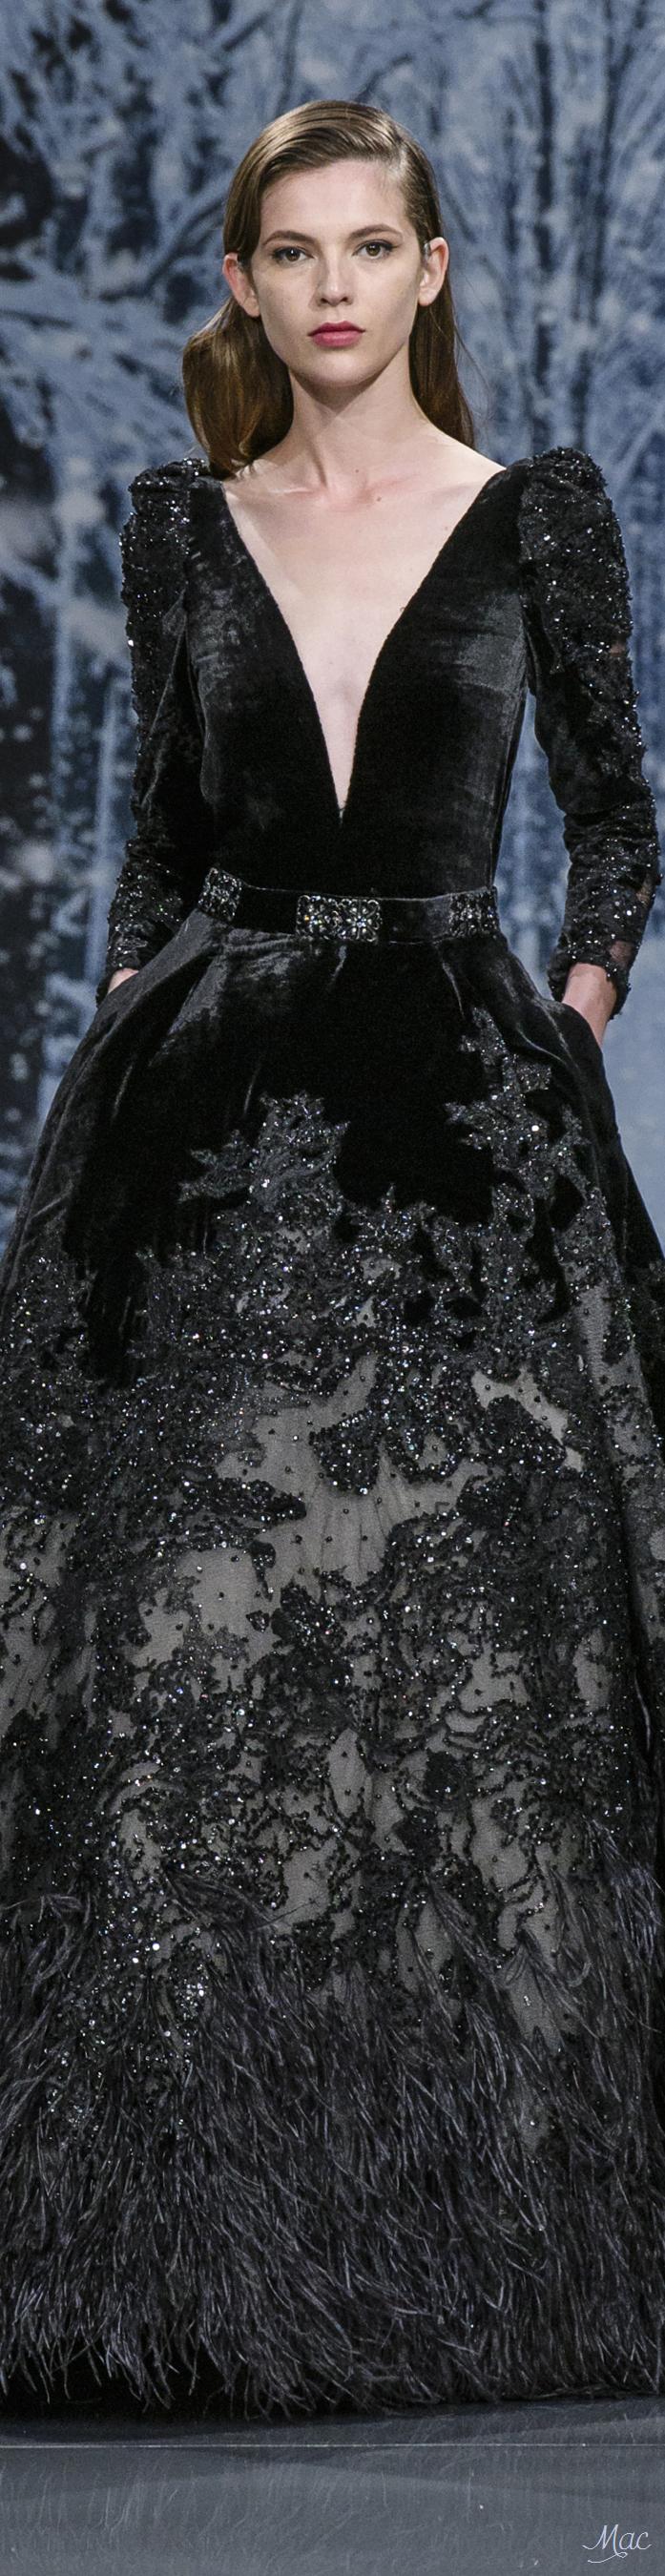 Fall haute couture ziad nakad womenus fashion pinterest